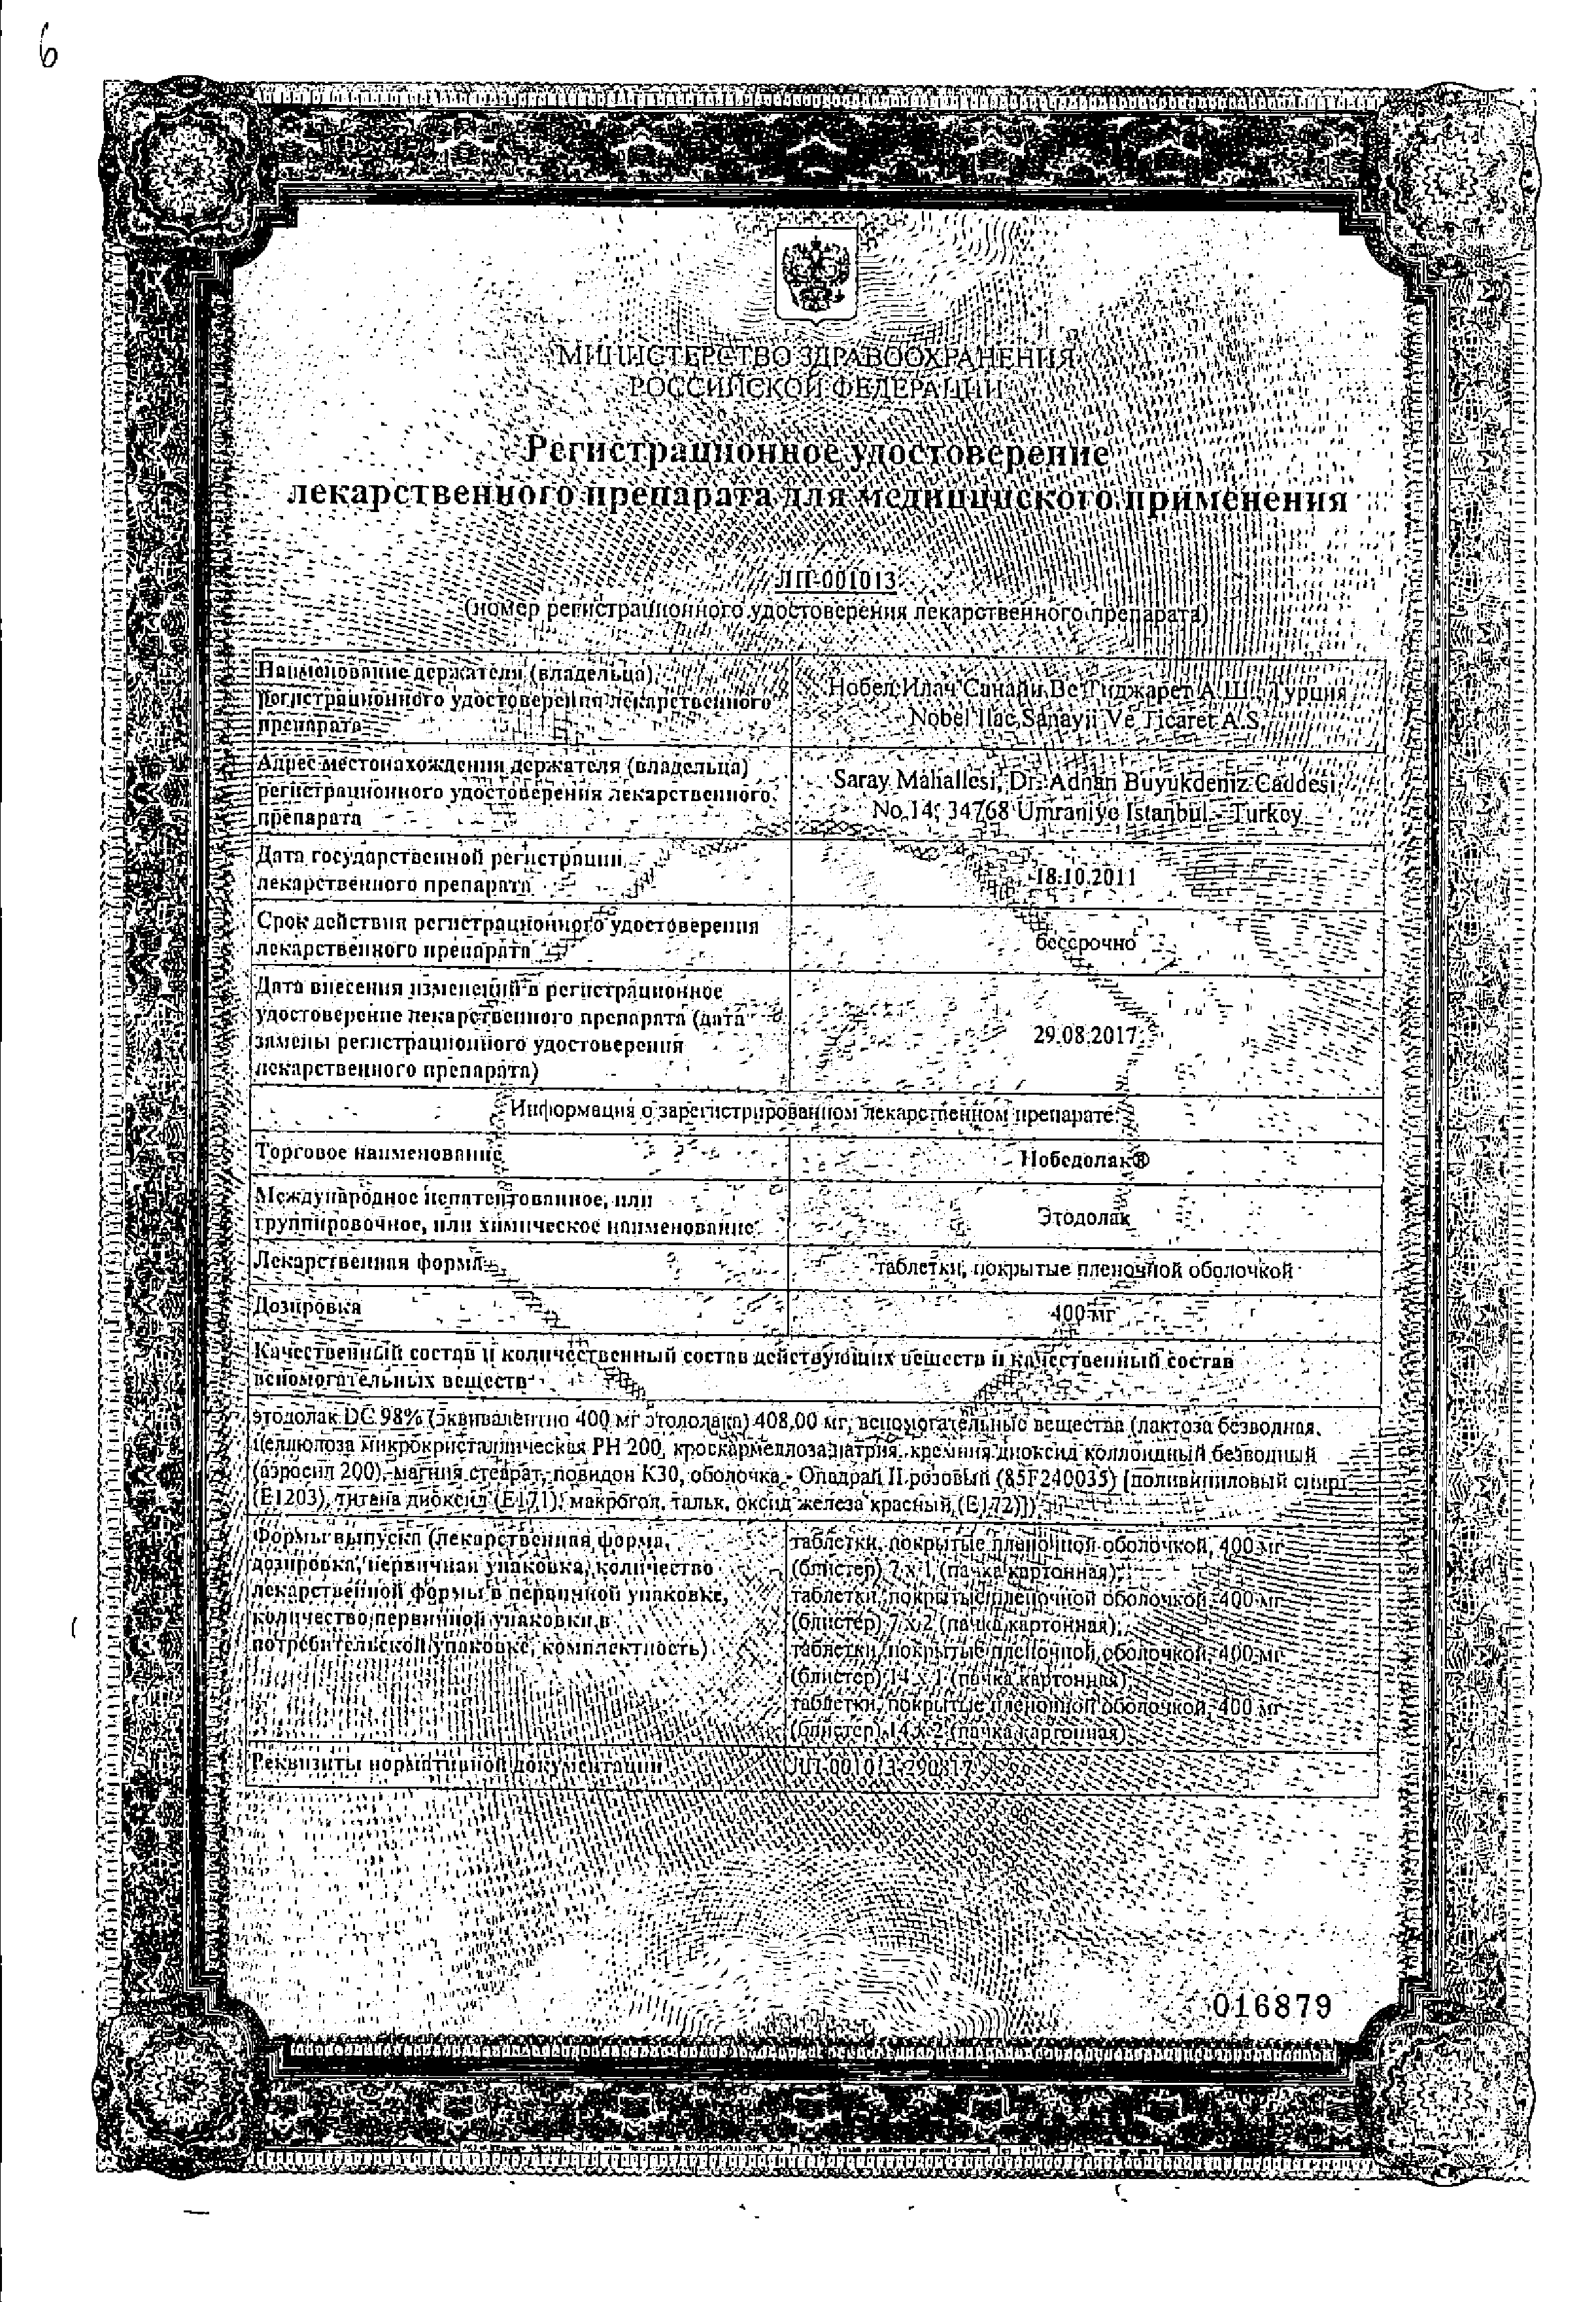 Нобедолак сертификат